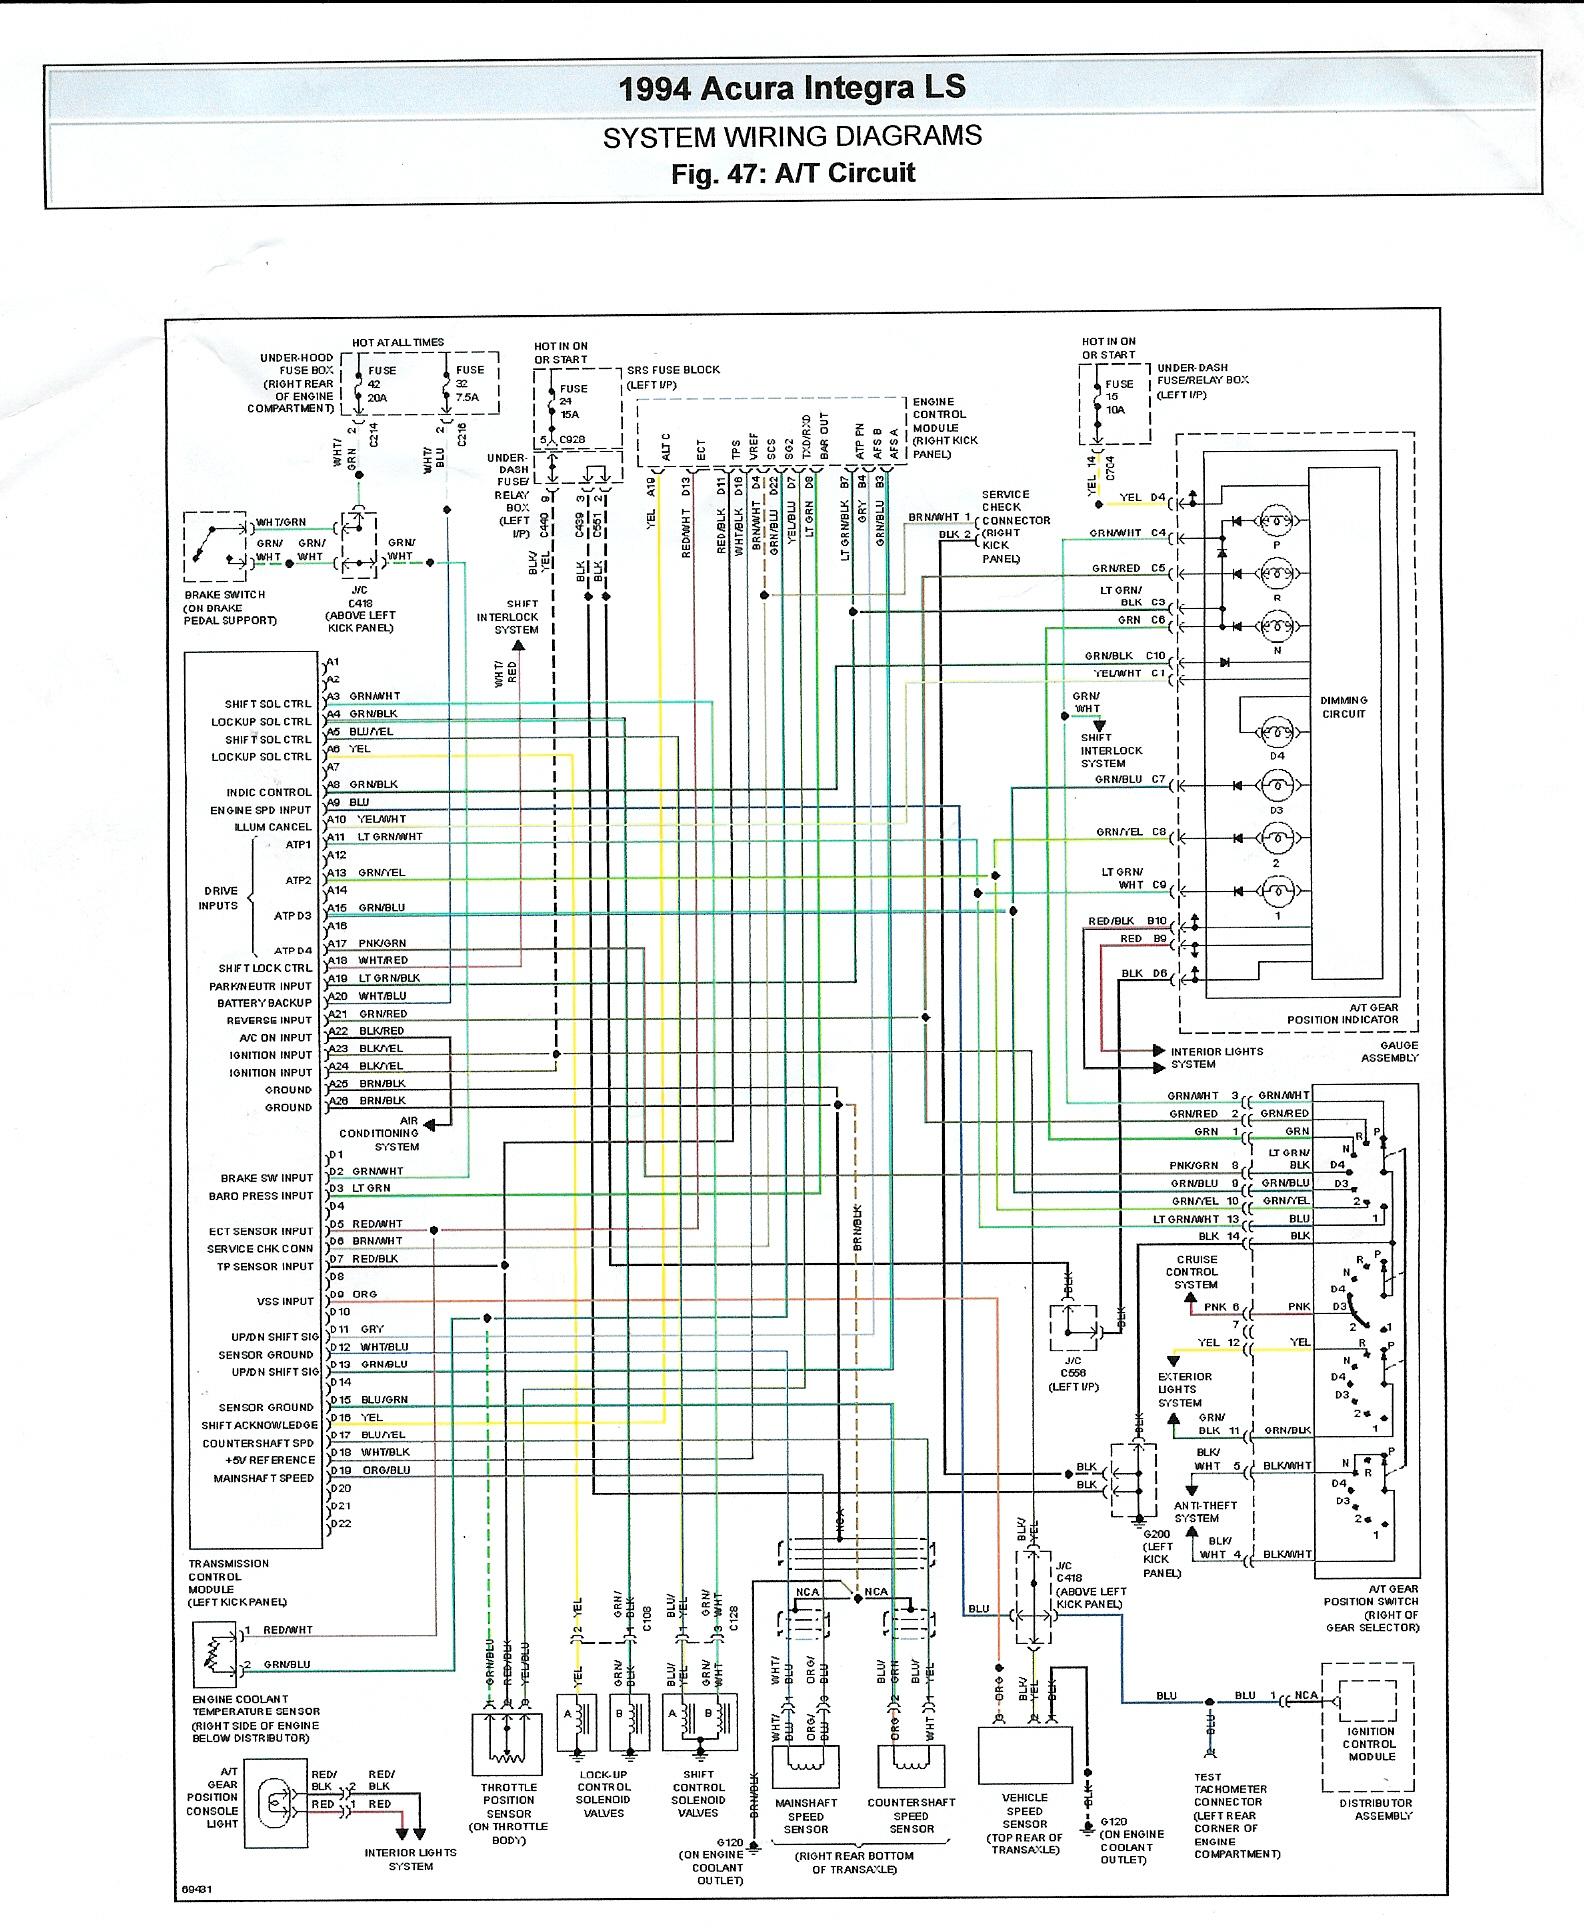 1995 Acura Integra Wiring Diagram Explore On The Net Jeep Grand Cherokee Headlight 92 Diagrams Schematic Name Rh 9 13 1 Systembeimroulette De Distributor